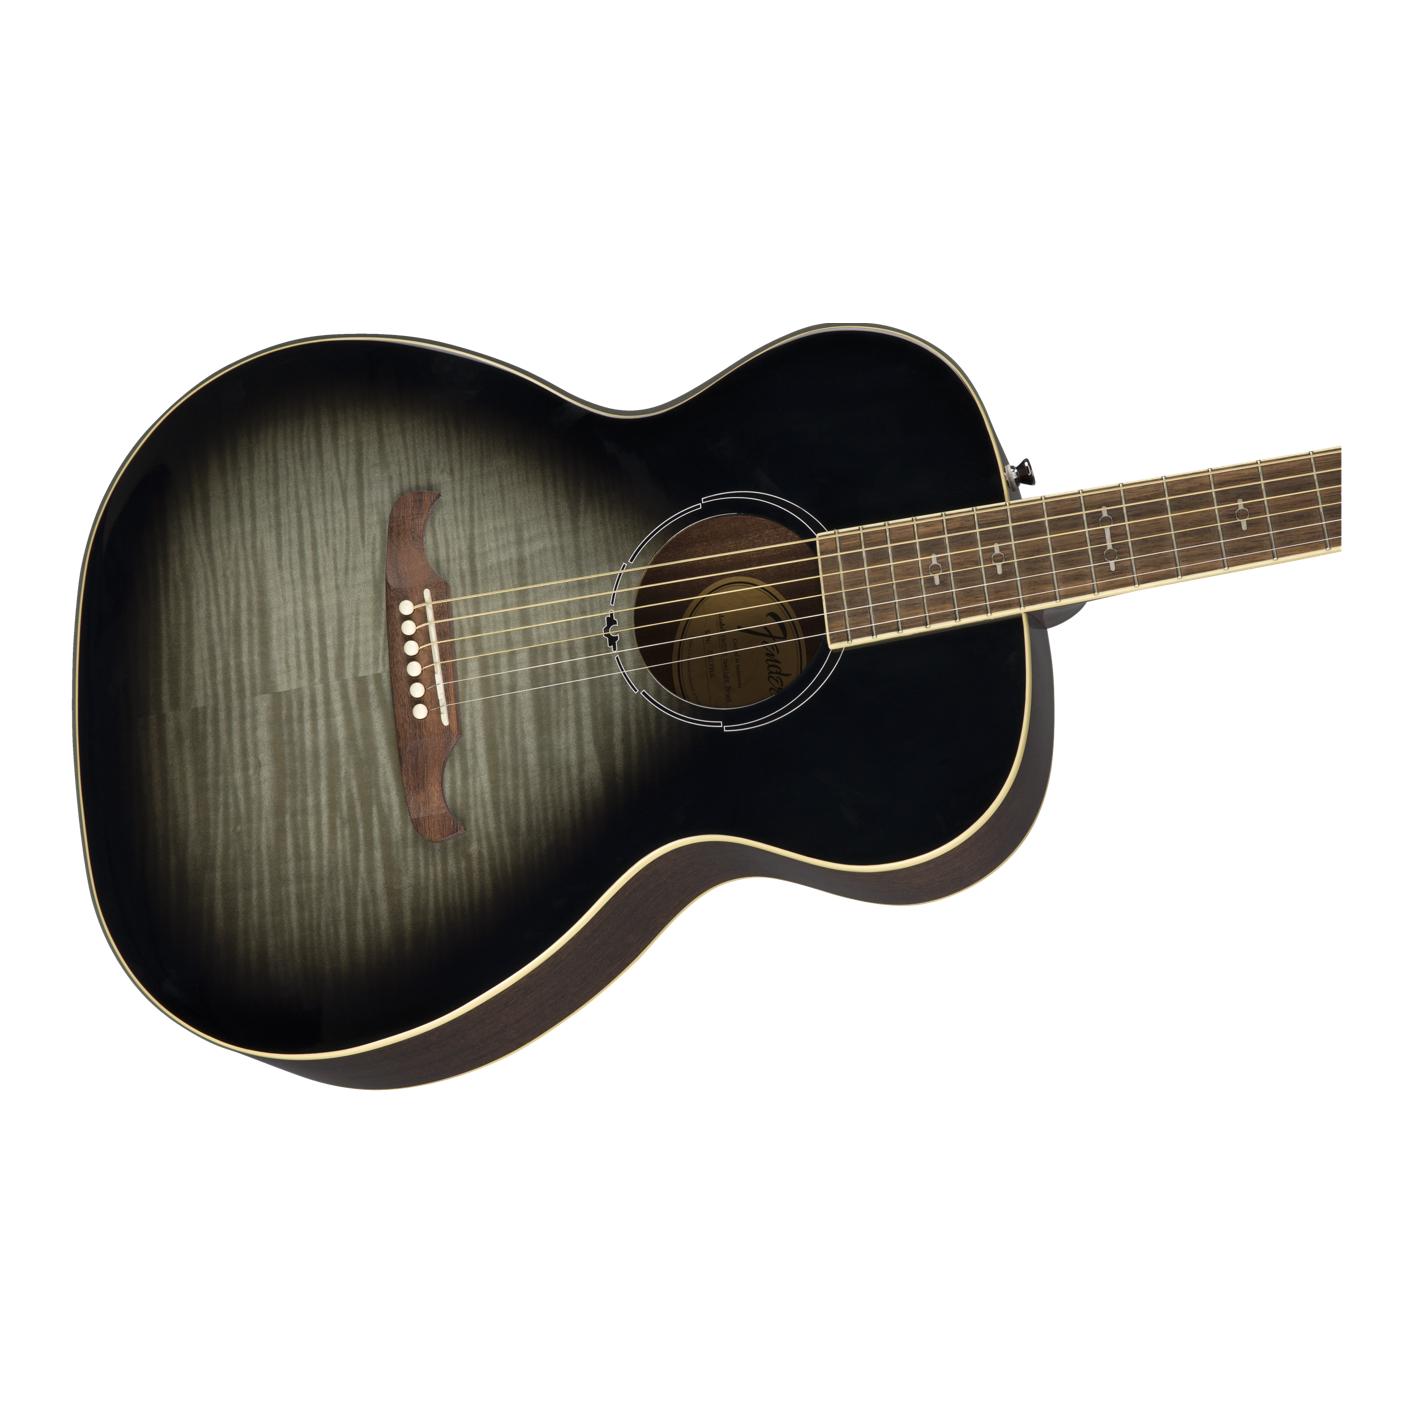 Fender FA-235E Moonlight Burst Electro Acoustic Guitar